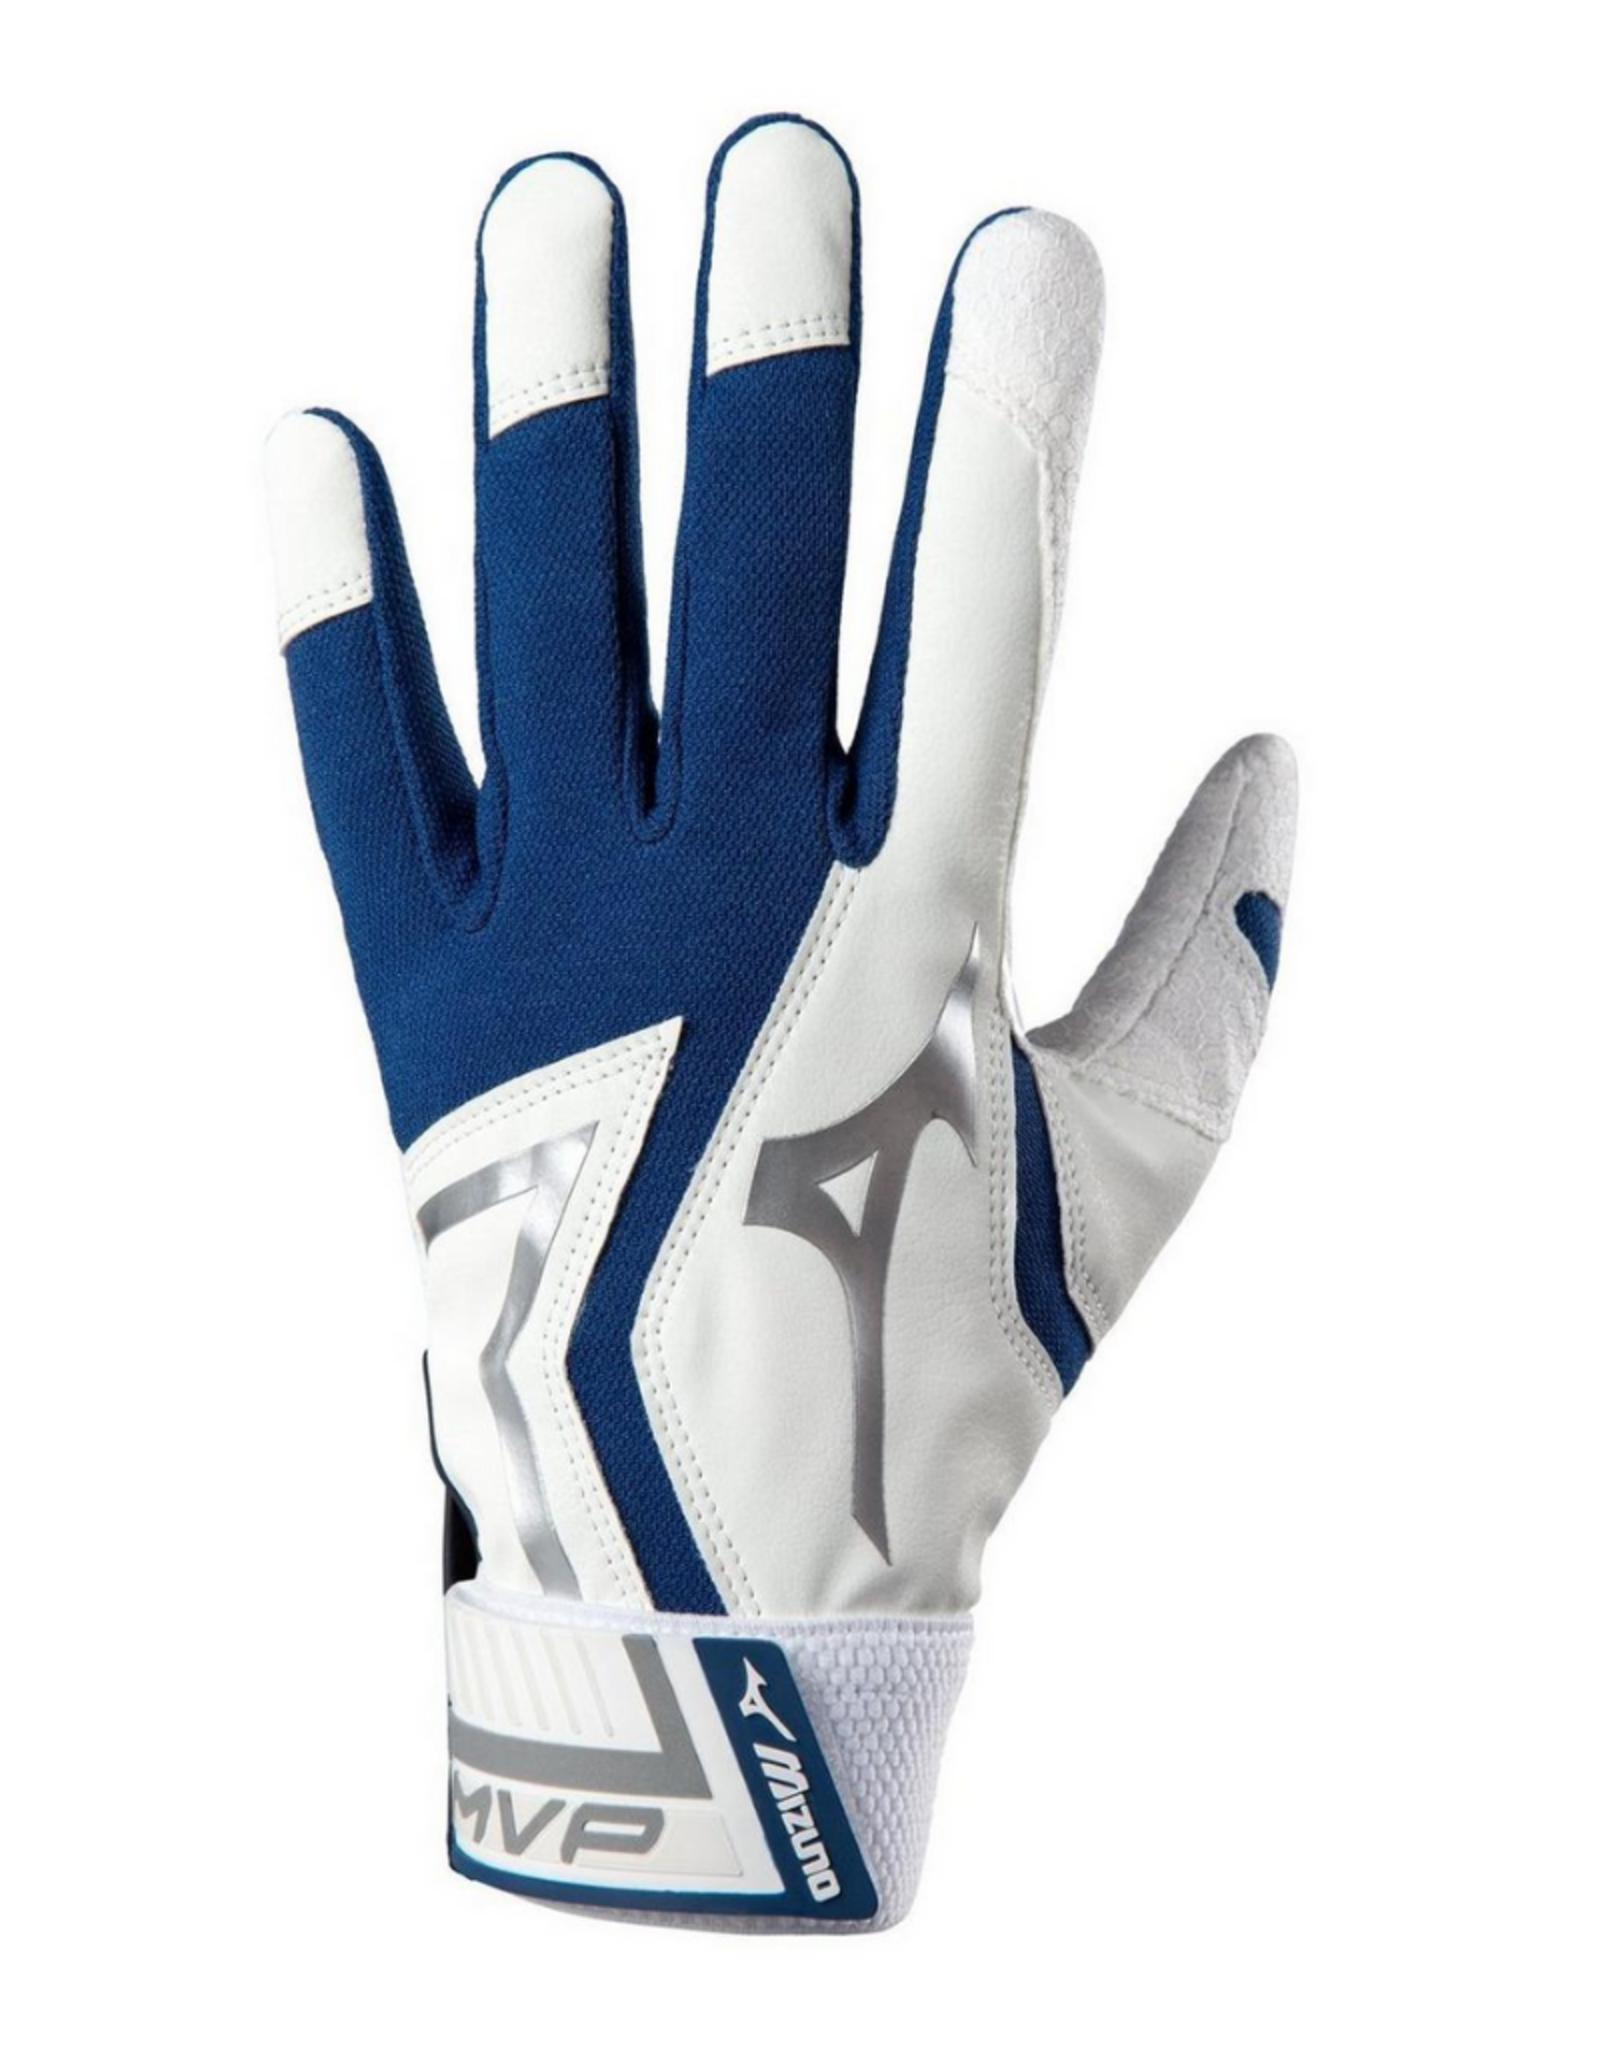 Mizuno MVP Adult Batting Gloves Navy/White